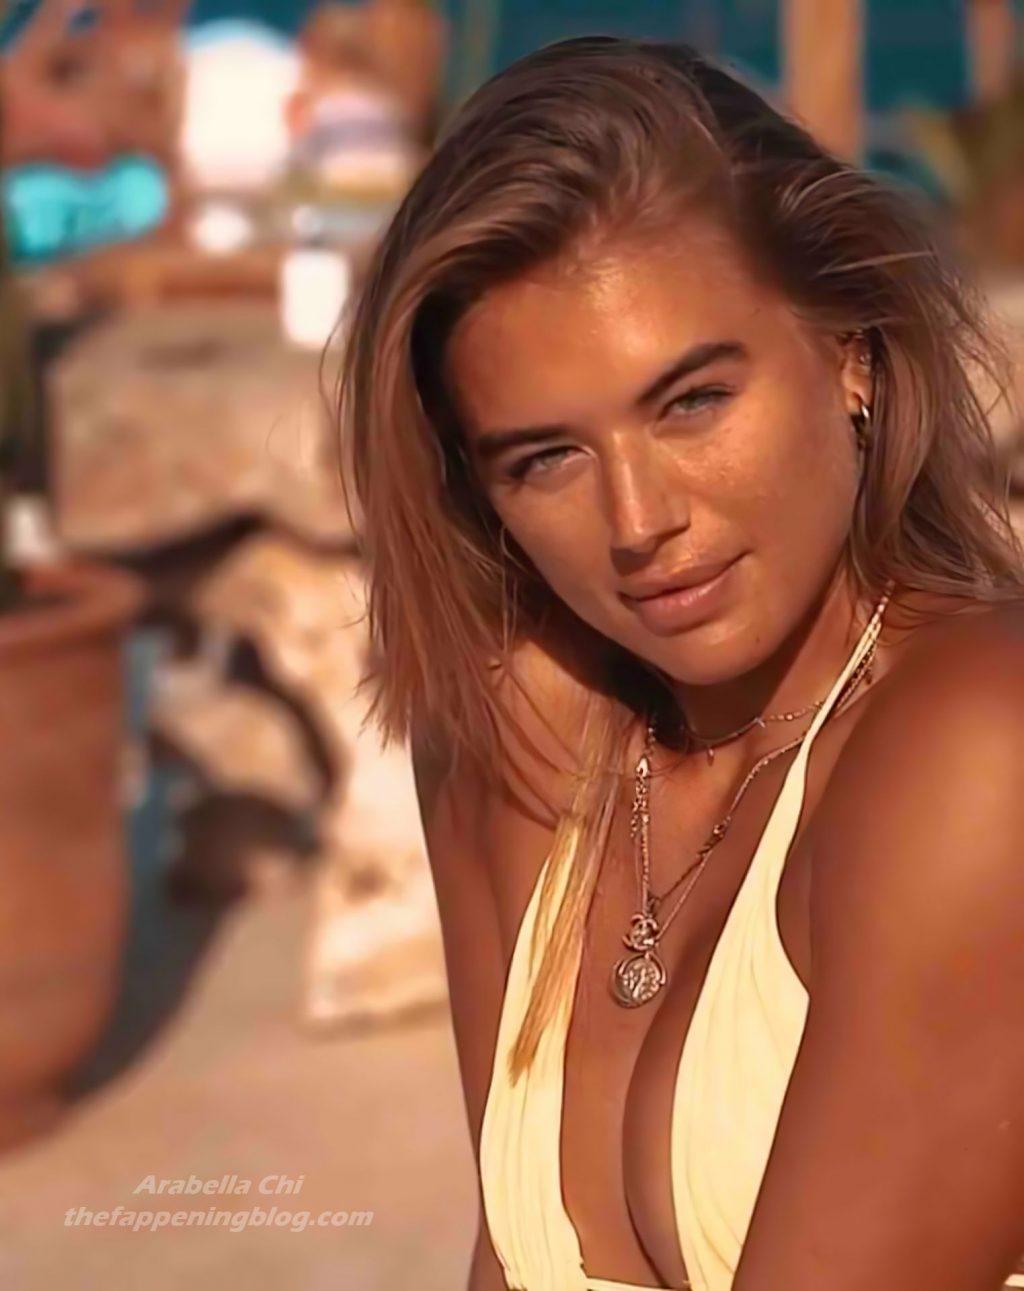 Tittyless Arabella Chi Shows Off Her Sexy Bikini Body (14 Pics + Video)